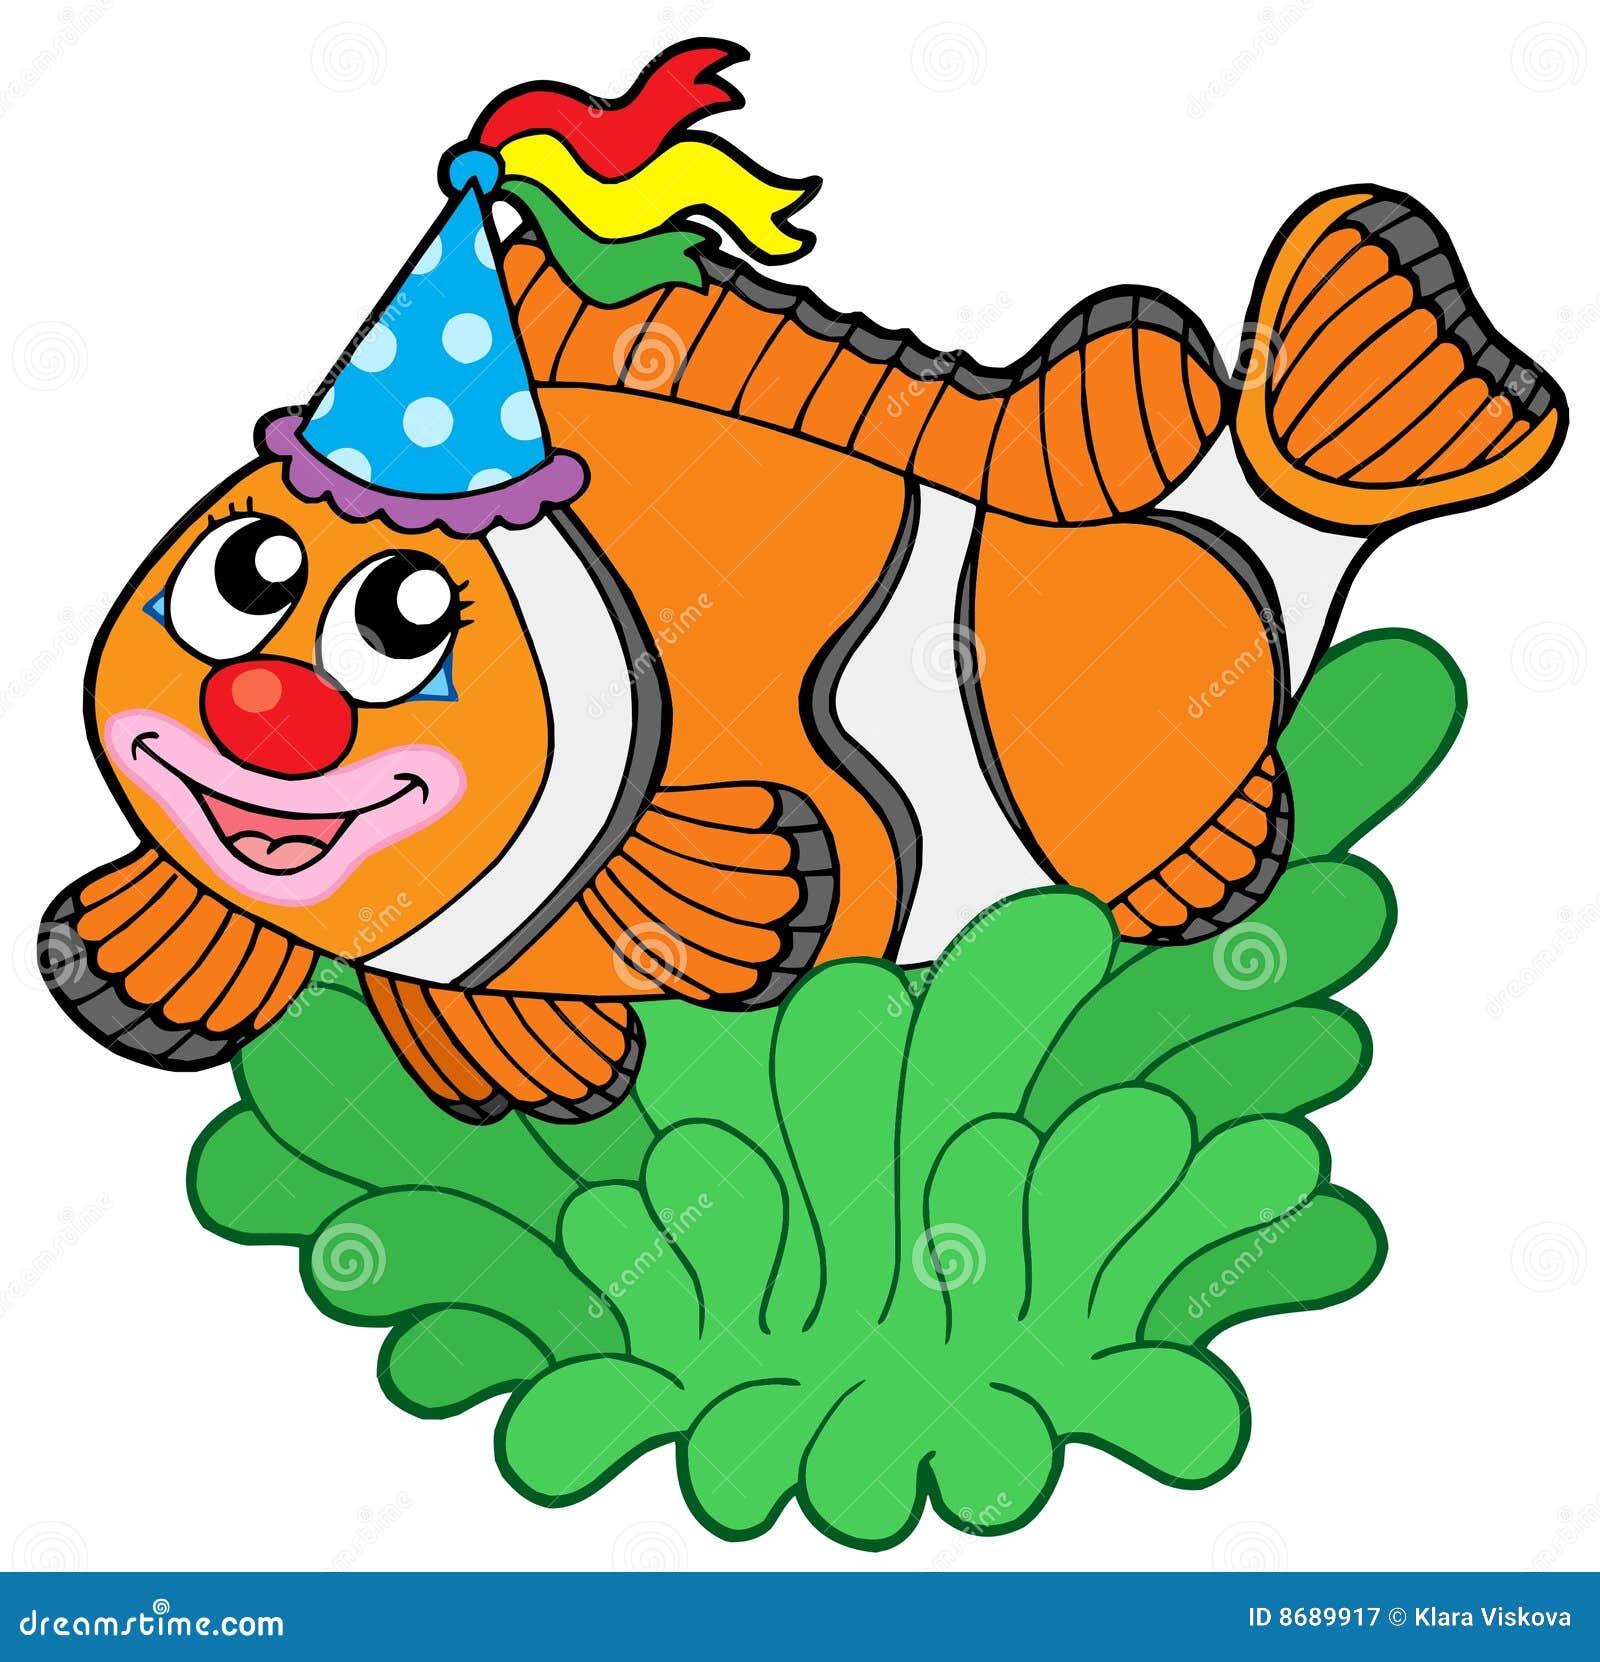 Cartoon Clownfish In Anemone Stock Vector Illustration Of Draw